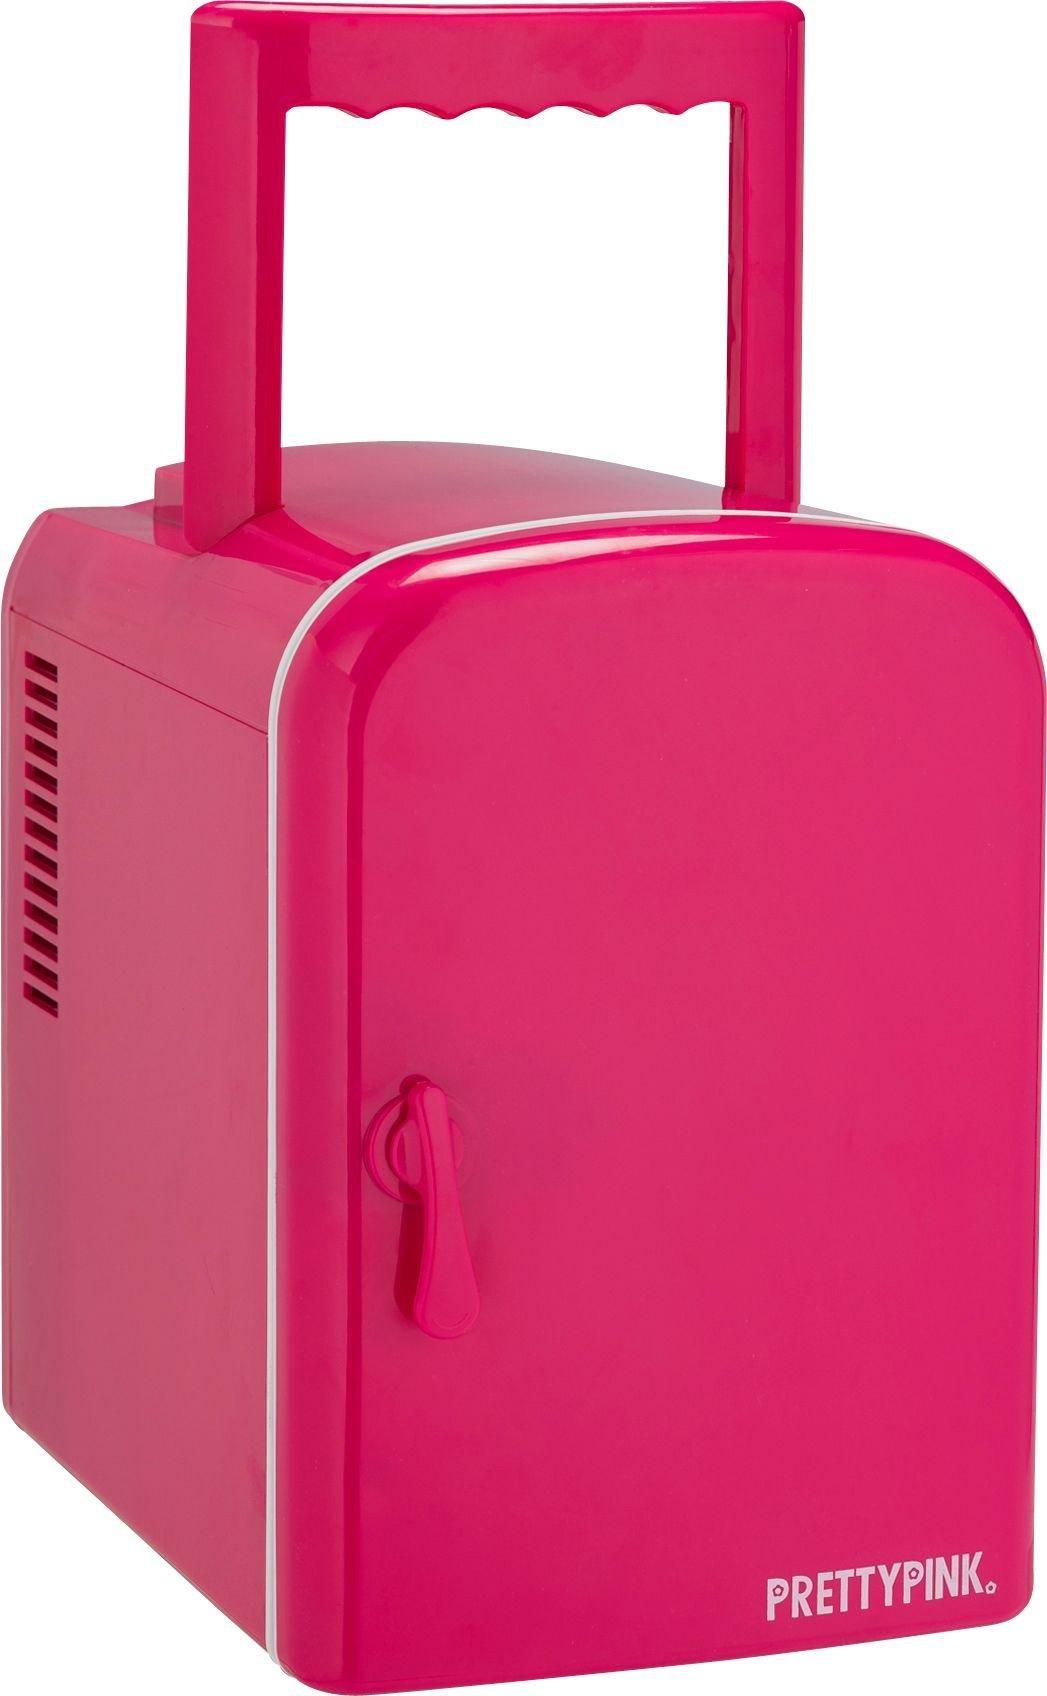 Buy 4 Litre Pink Mini Travel Fridge at Argos.co.uk - Your Online ...